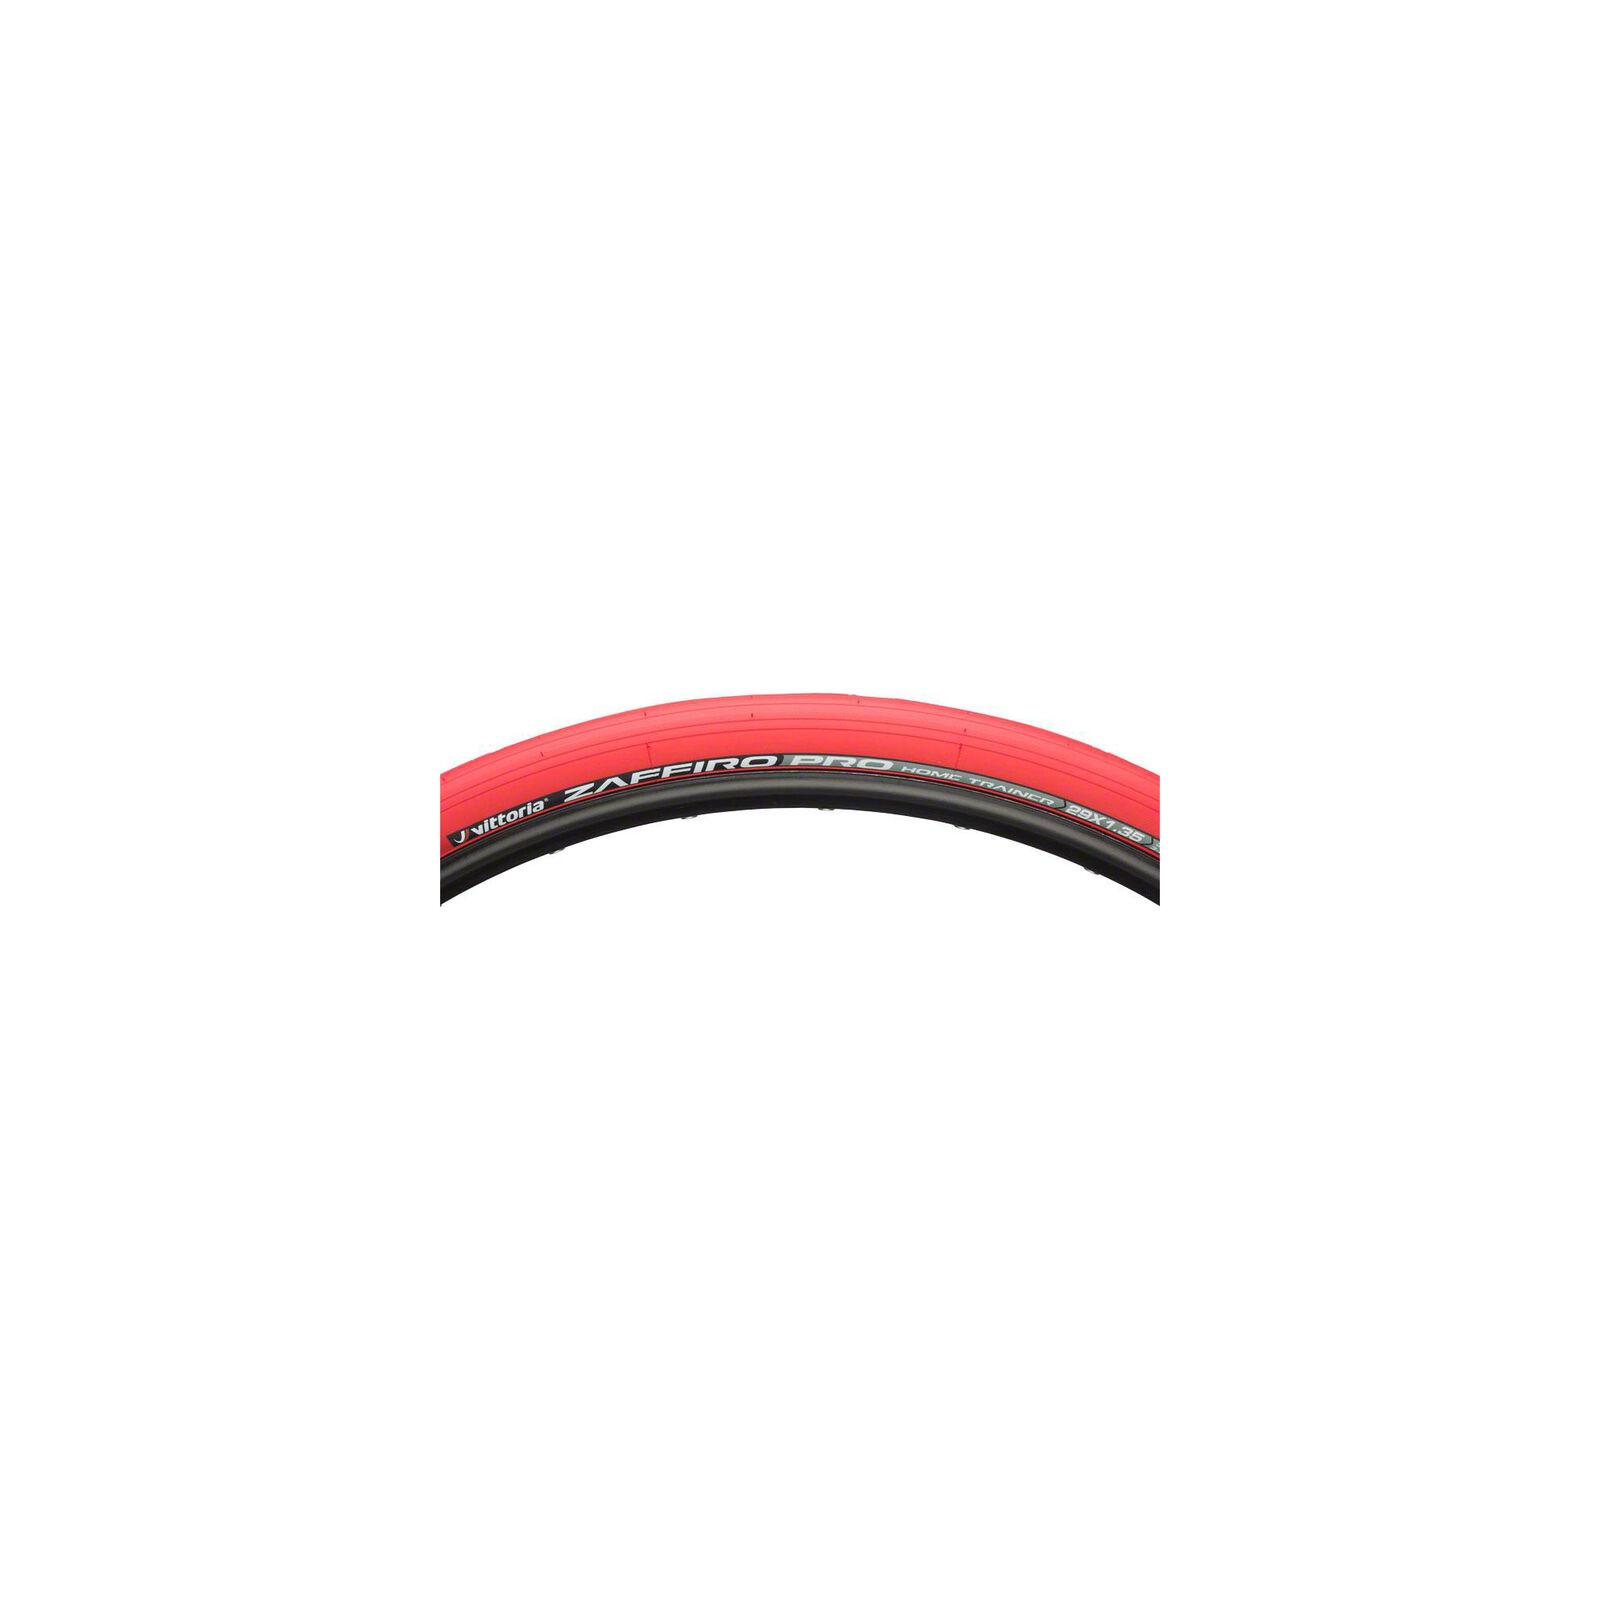 Vittoria Zaffiro Pro Home Trainer Tire  Folding Clincher, 29x1.35, Red